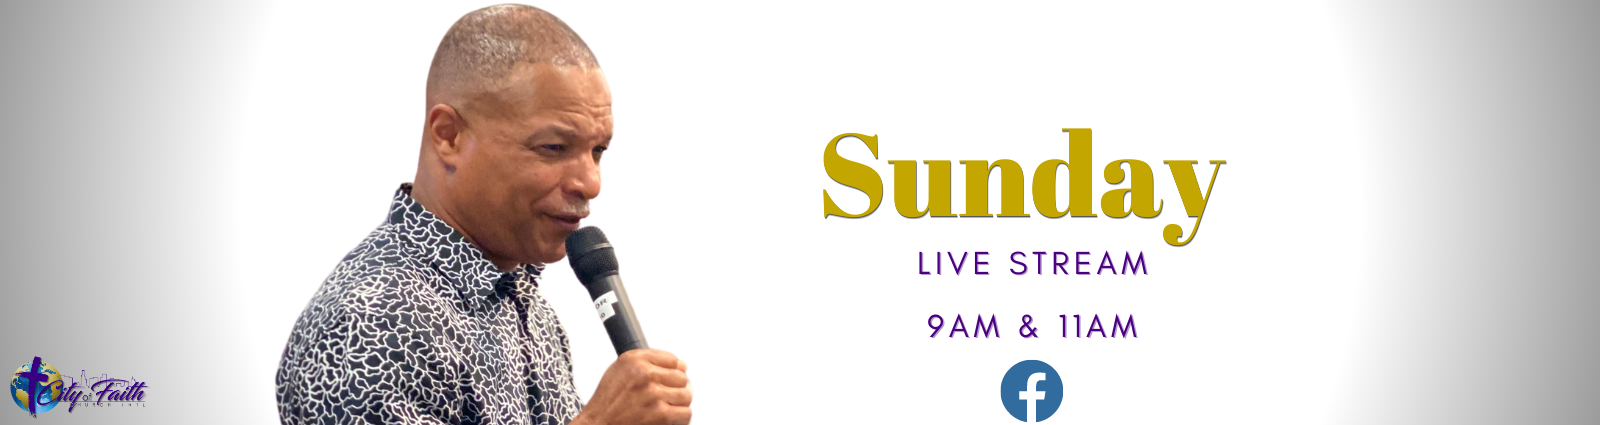 Sunday Live Stream With Pastor Robert Gardner